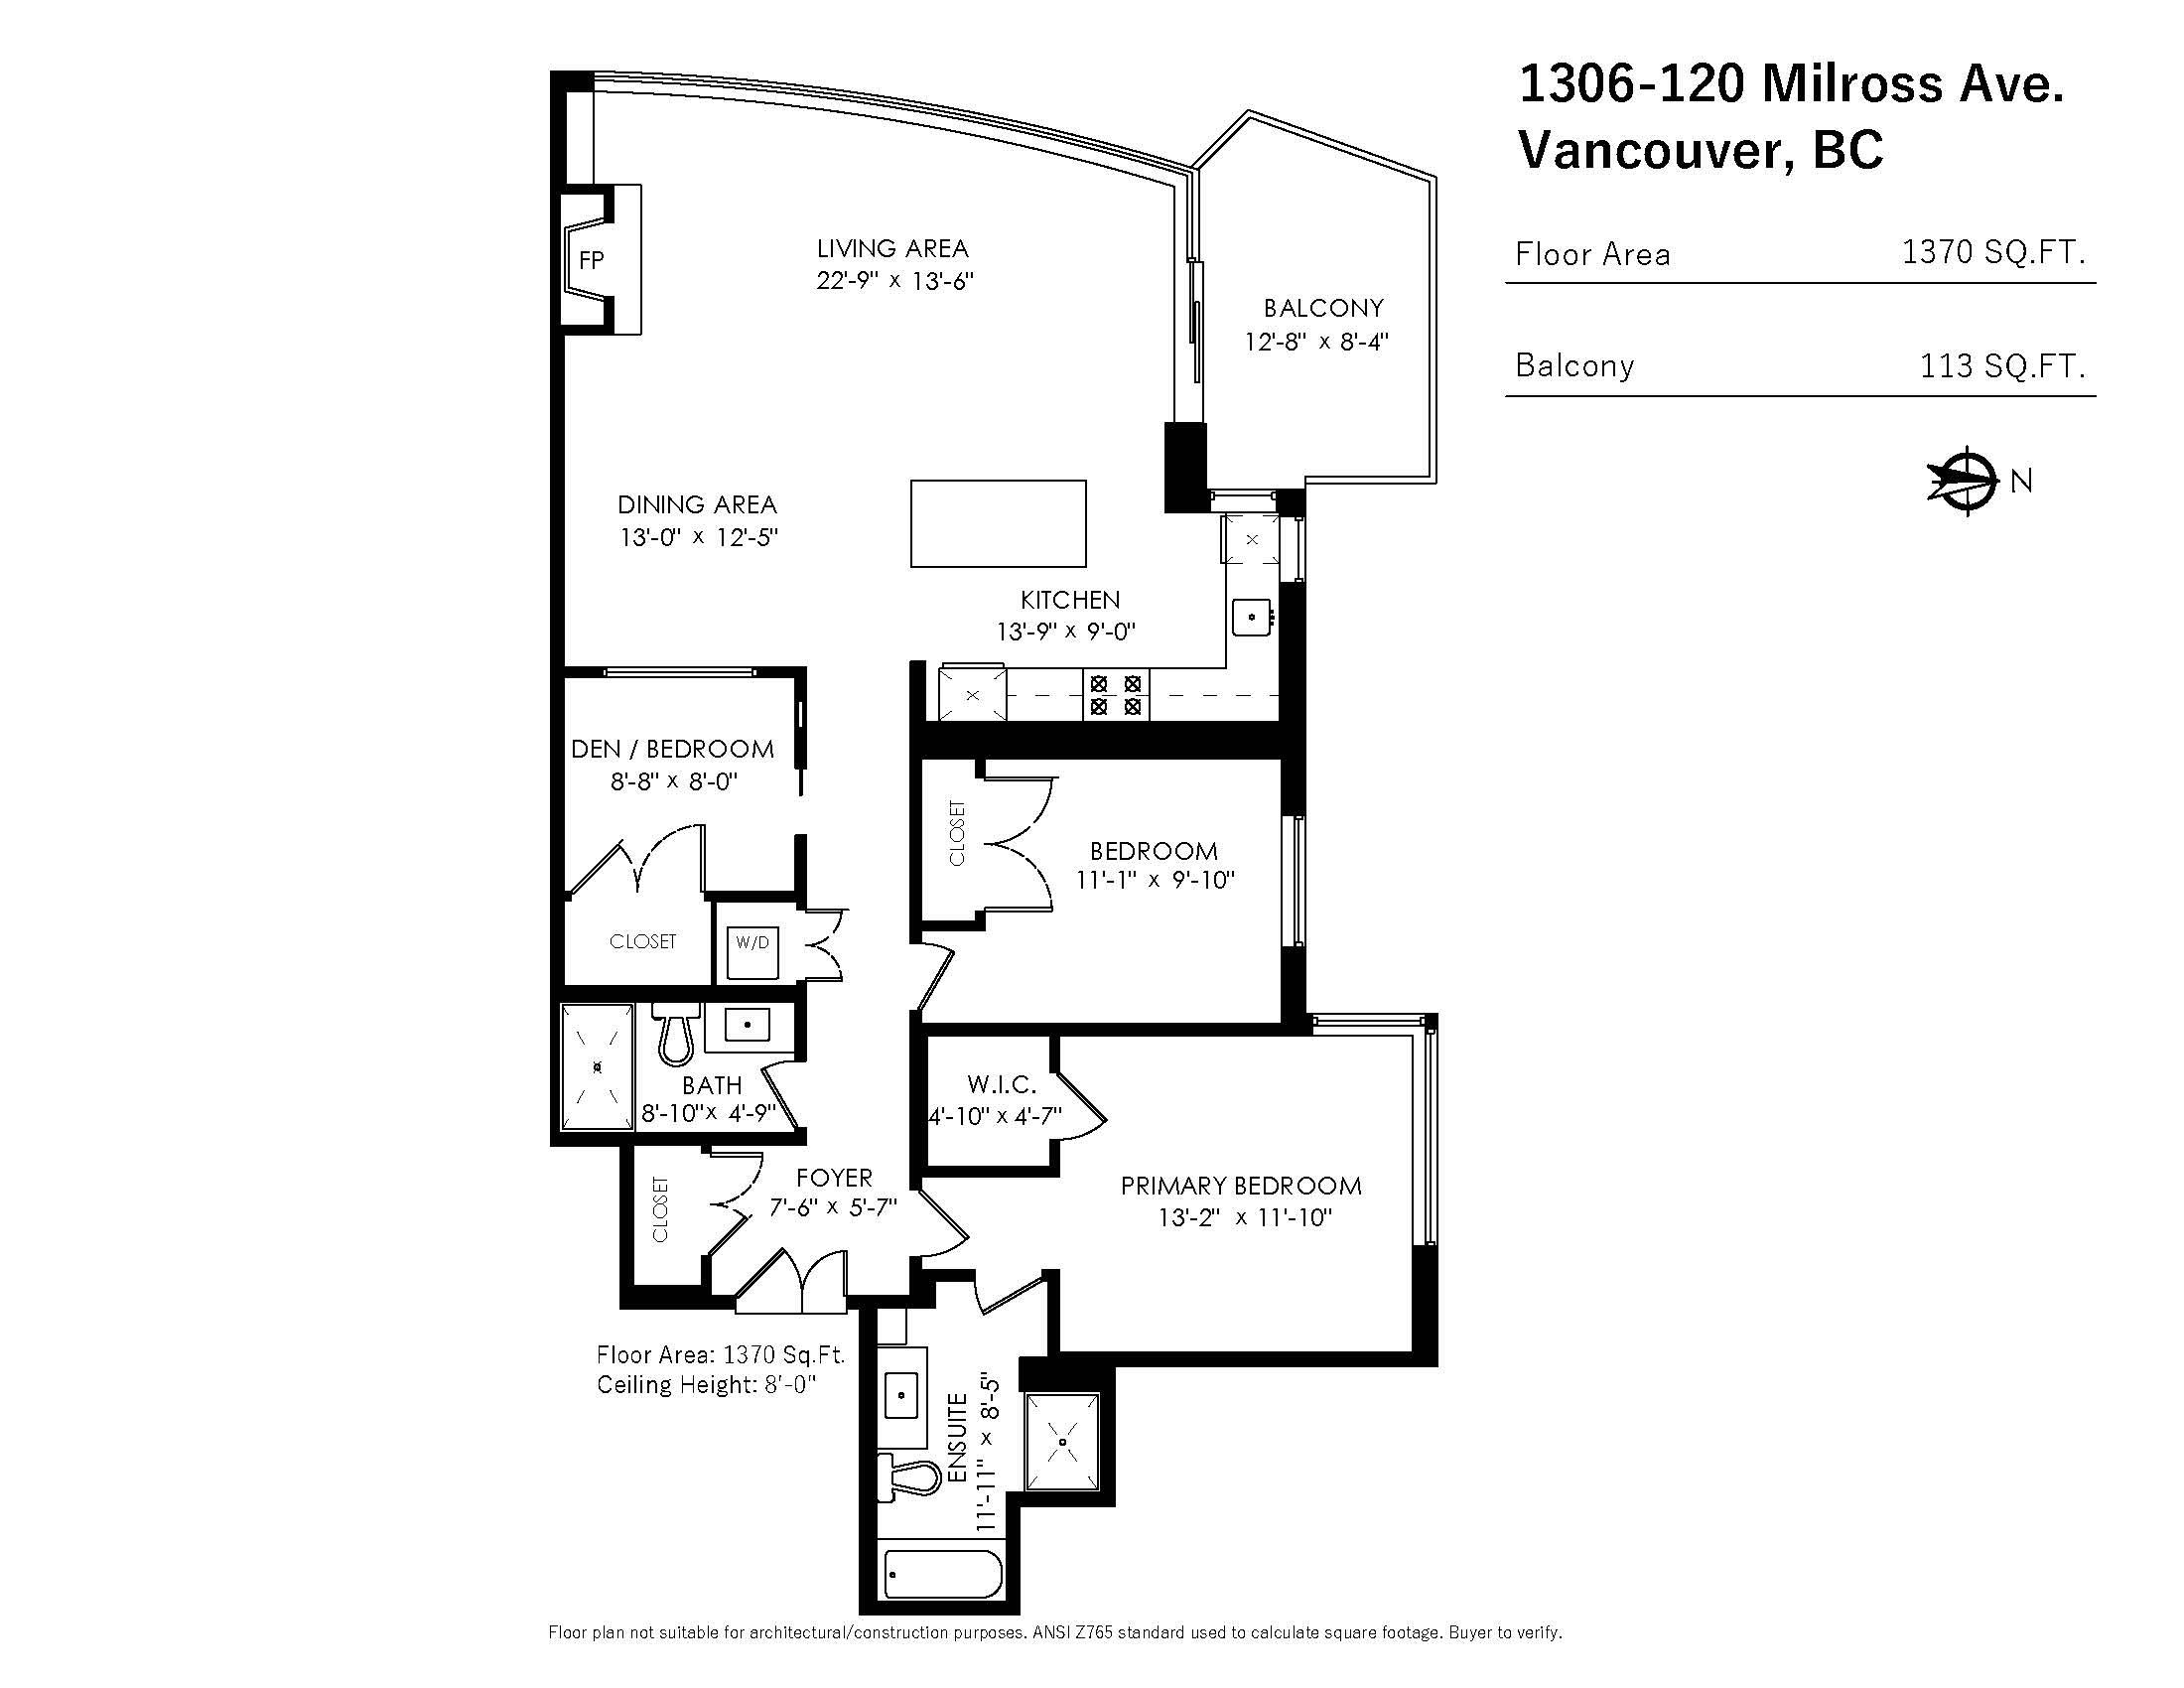 1306 120 Milross Ave - Floor Plan